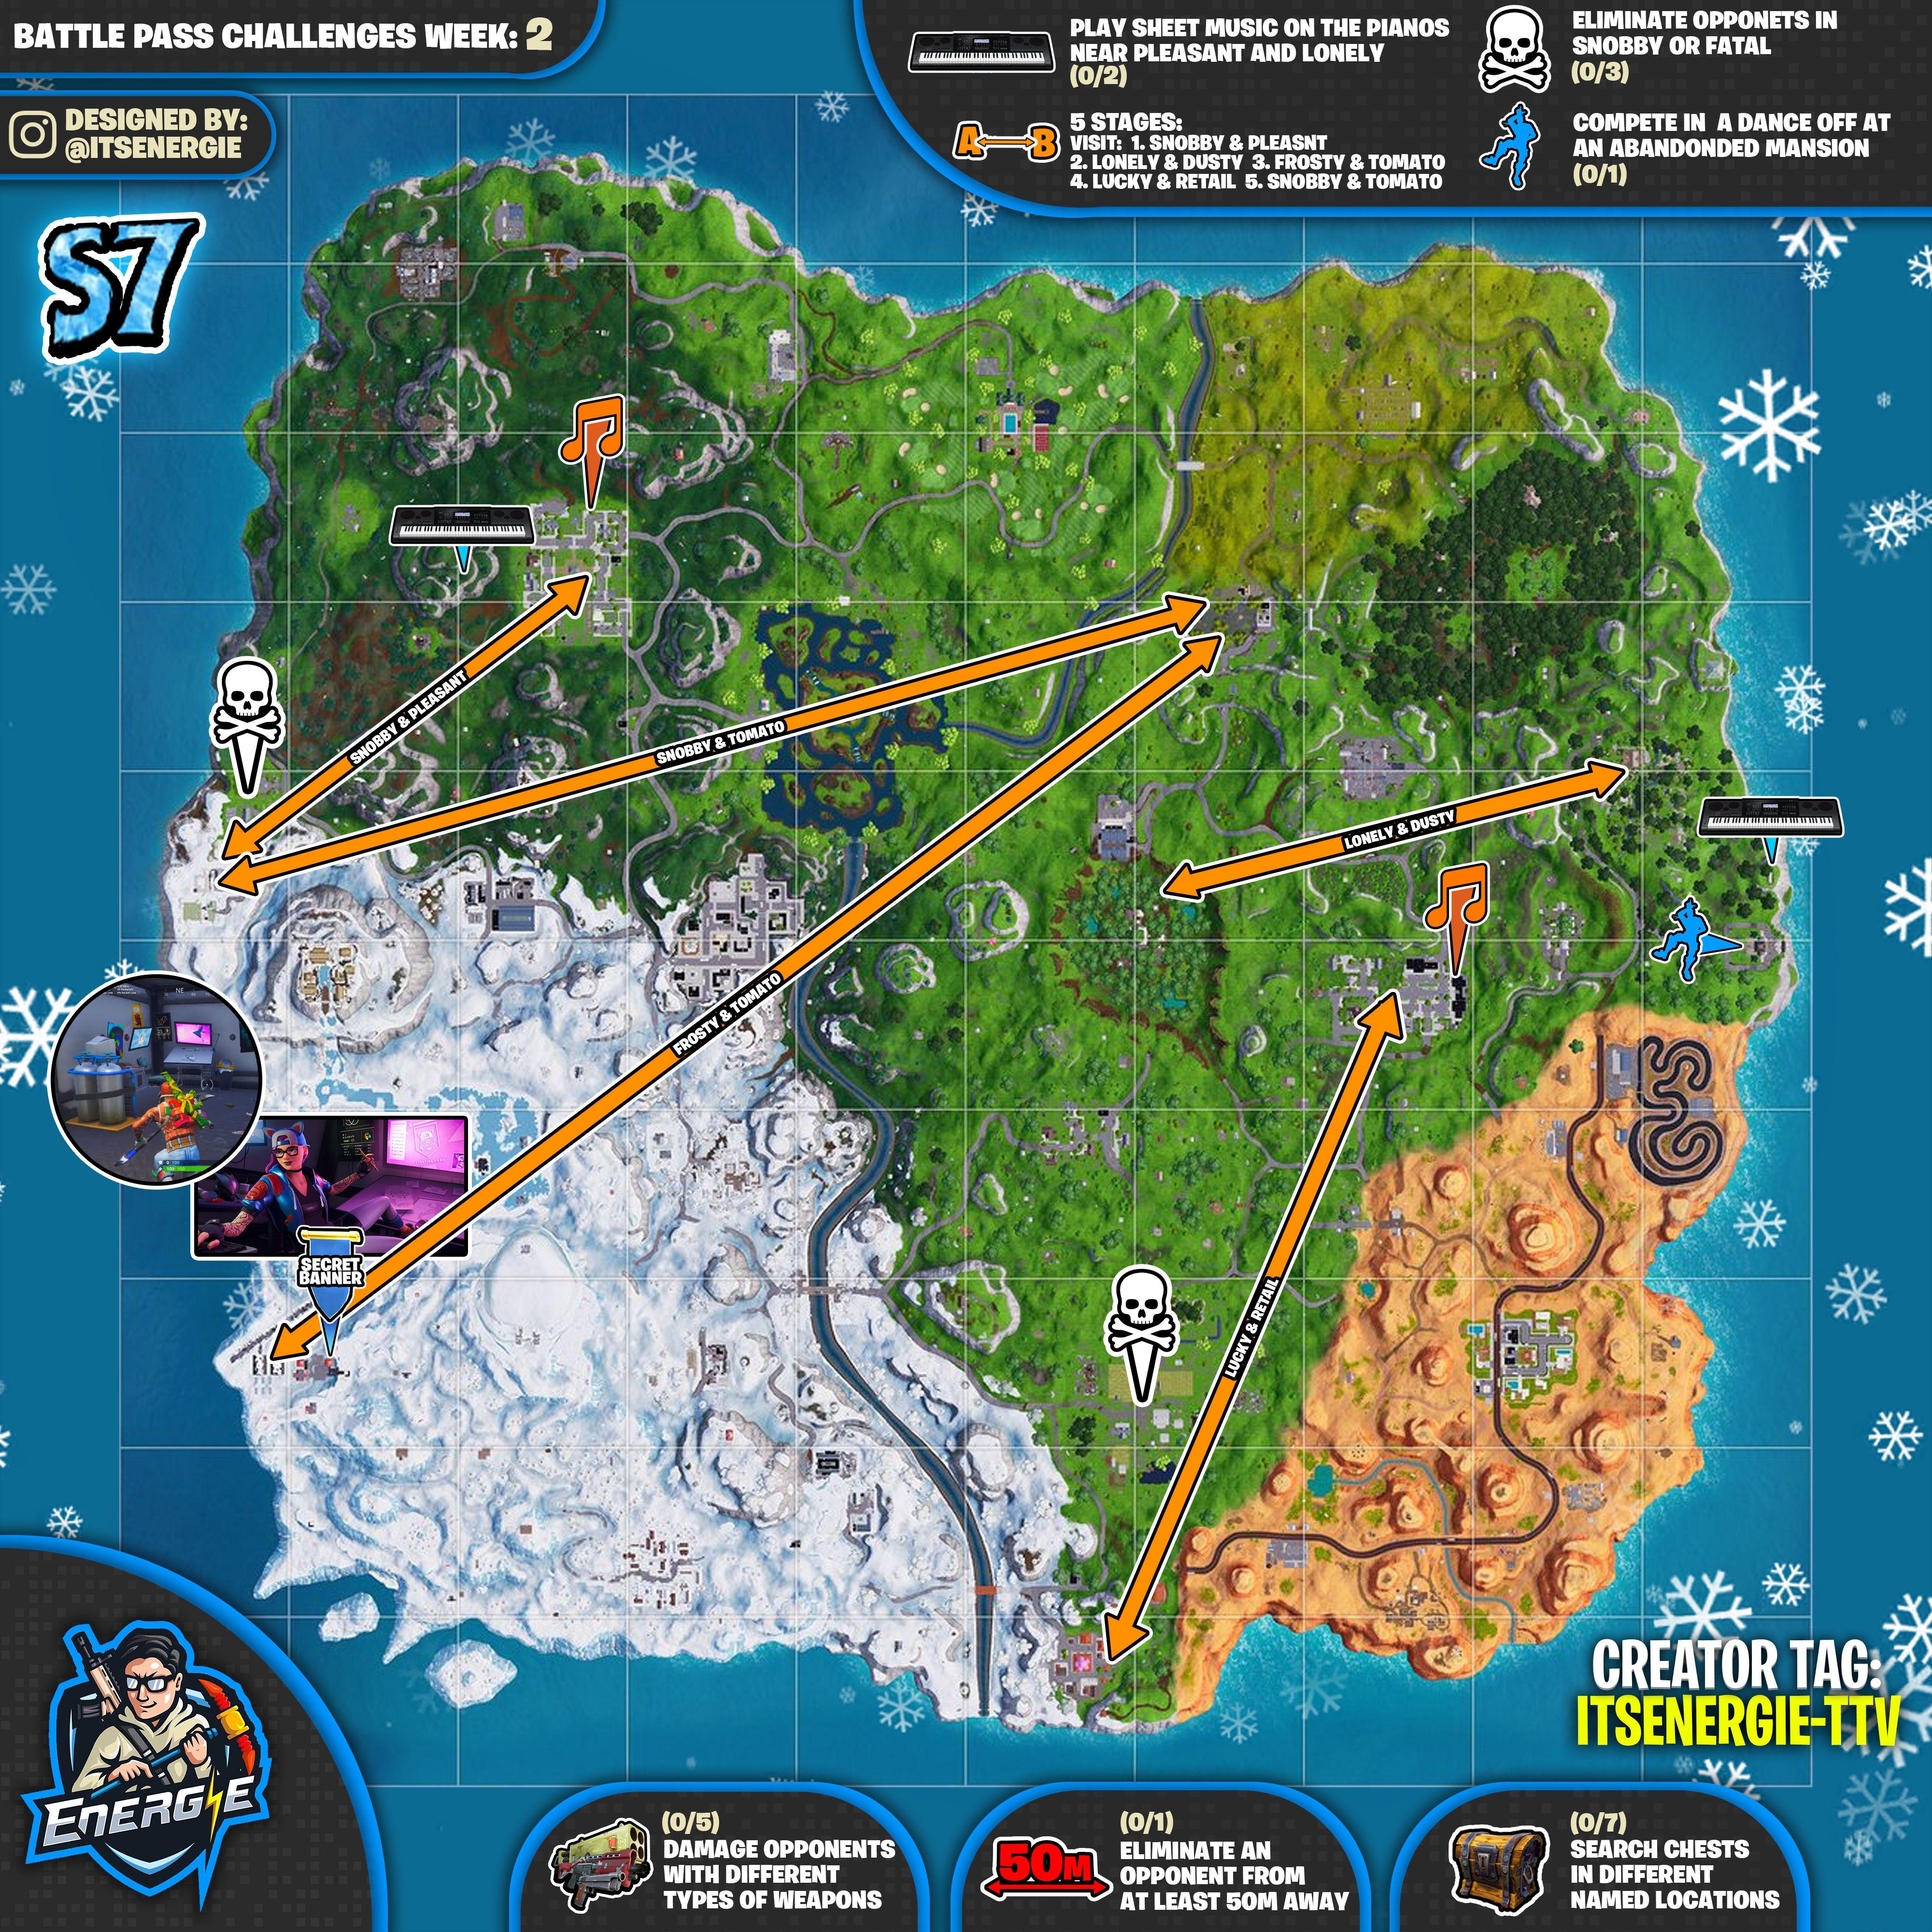 Fortnite Cheat Sheet Map For Season 7 Week 2 Challenges The Fortnite